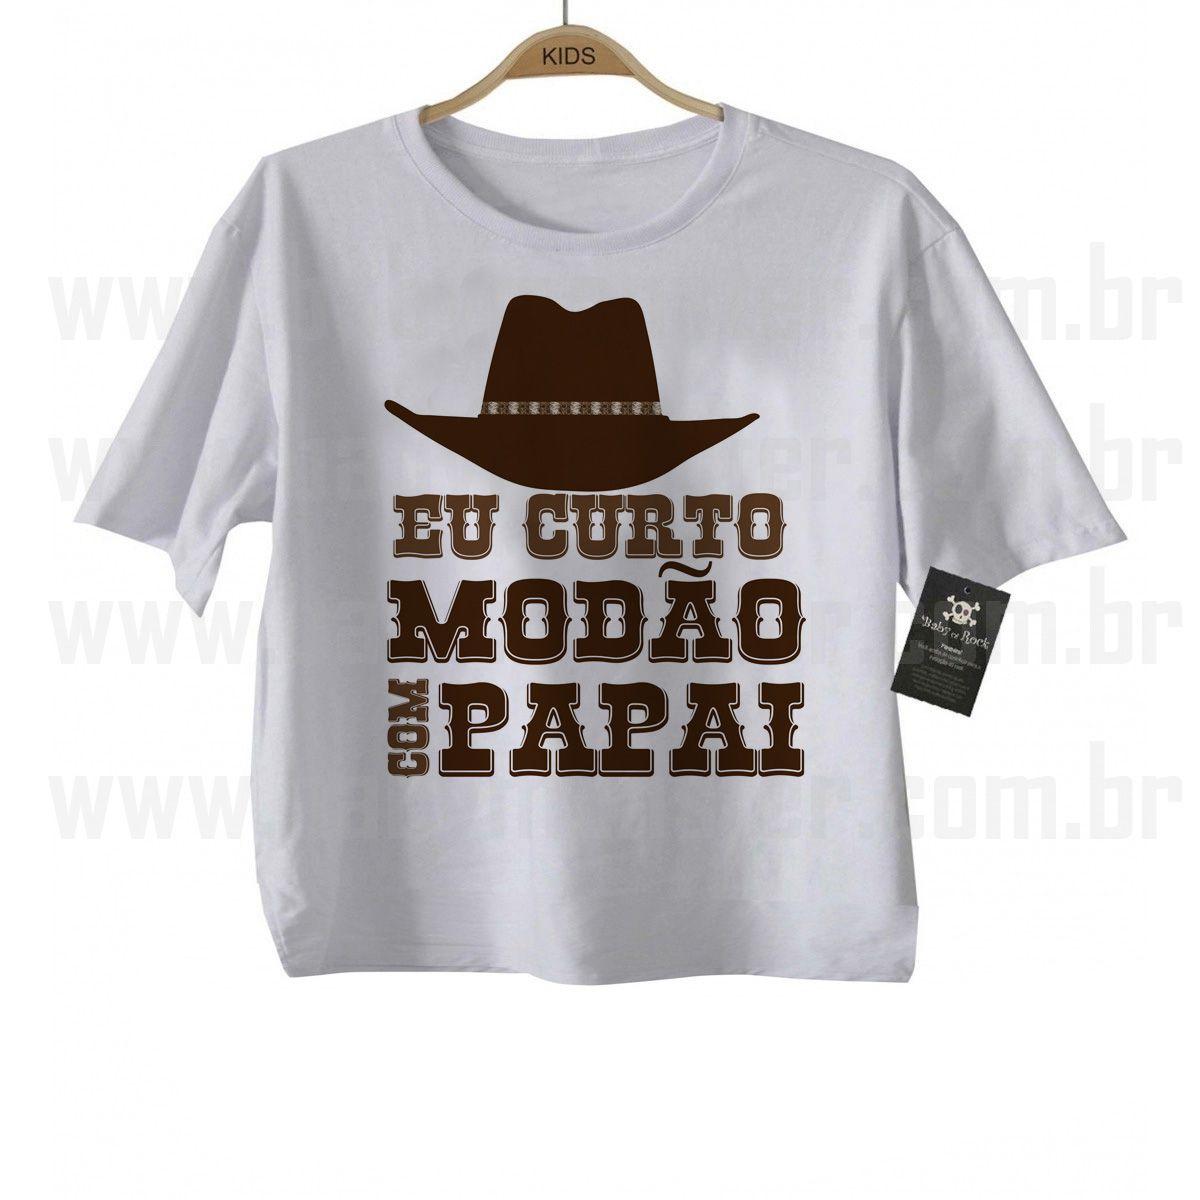 Camiseta Sertanejo Curto Modão com o Papai - White  - Baby Monster - Body Bebe